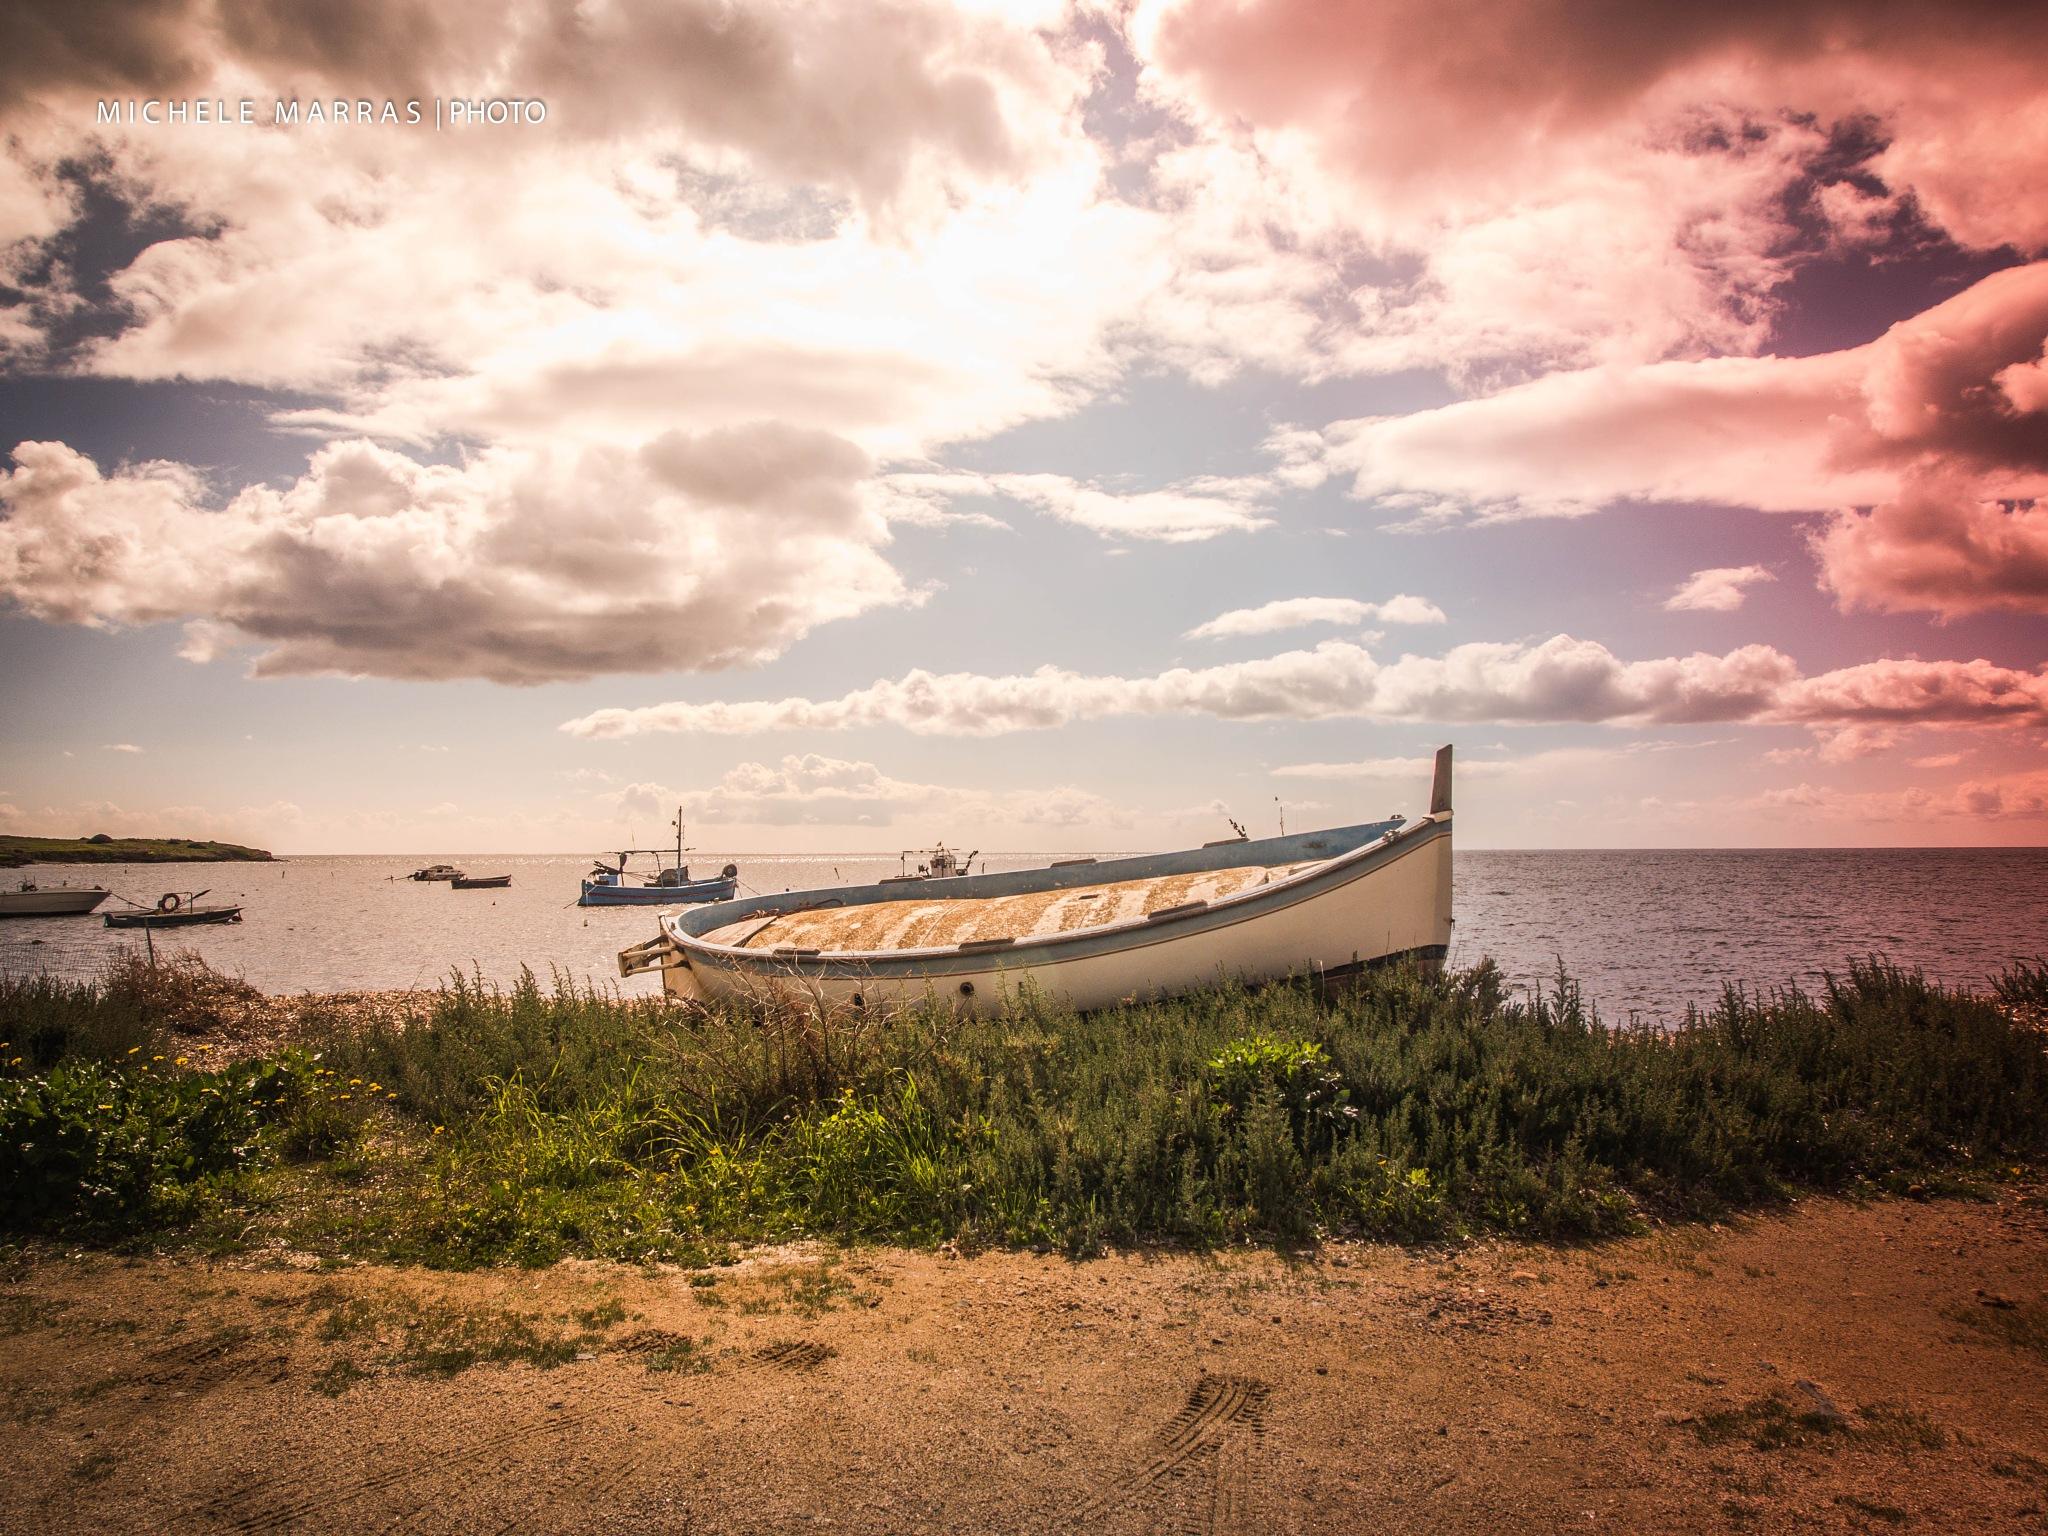 Barca in secca by Michele Pinna Marras